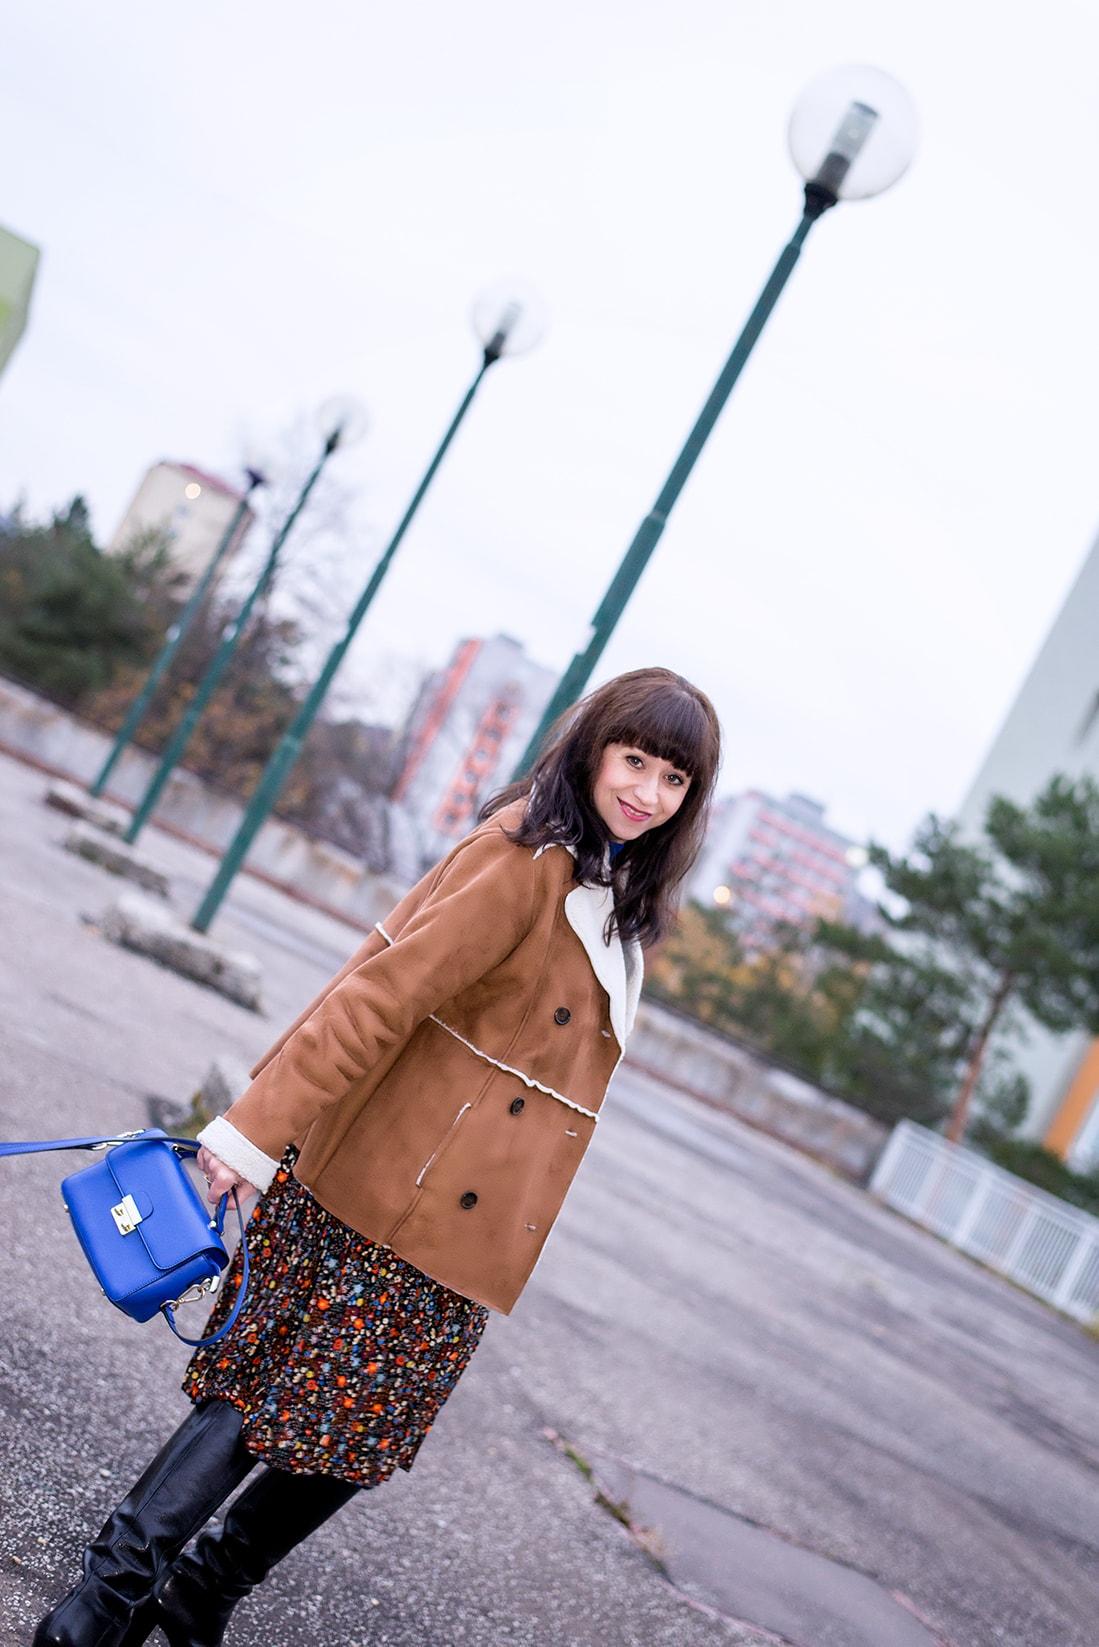 V NOWOM TARGU A SEMIŠOVÁ BUNDA NIELEN PRE BLOGERKU_Katharina-fashion is beautiful blog 14_Kvetovaná plisovaná sukňa_Kabelka JEJ_Katarína Jakubčová_Fashion blogerka